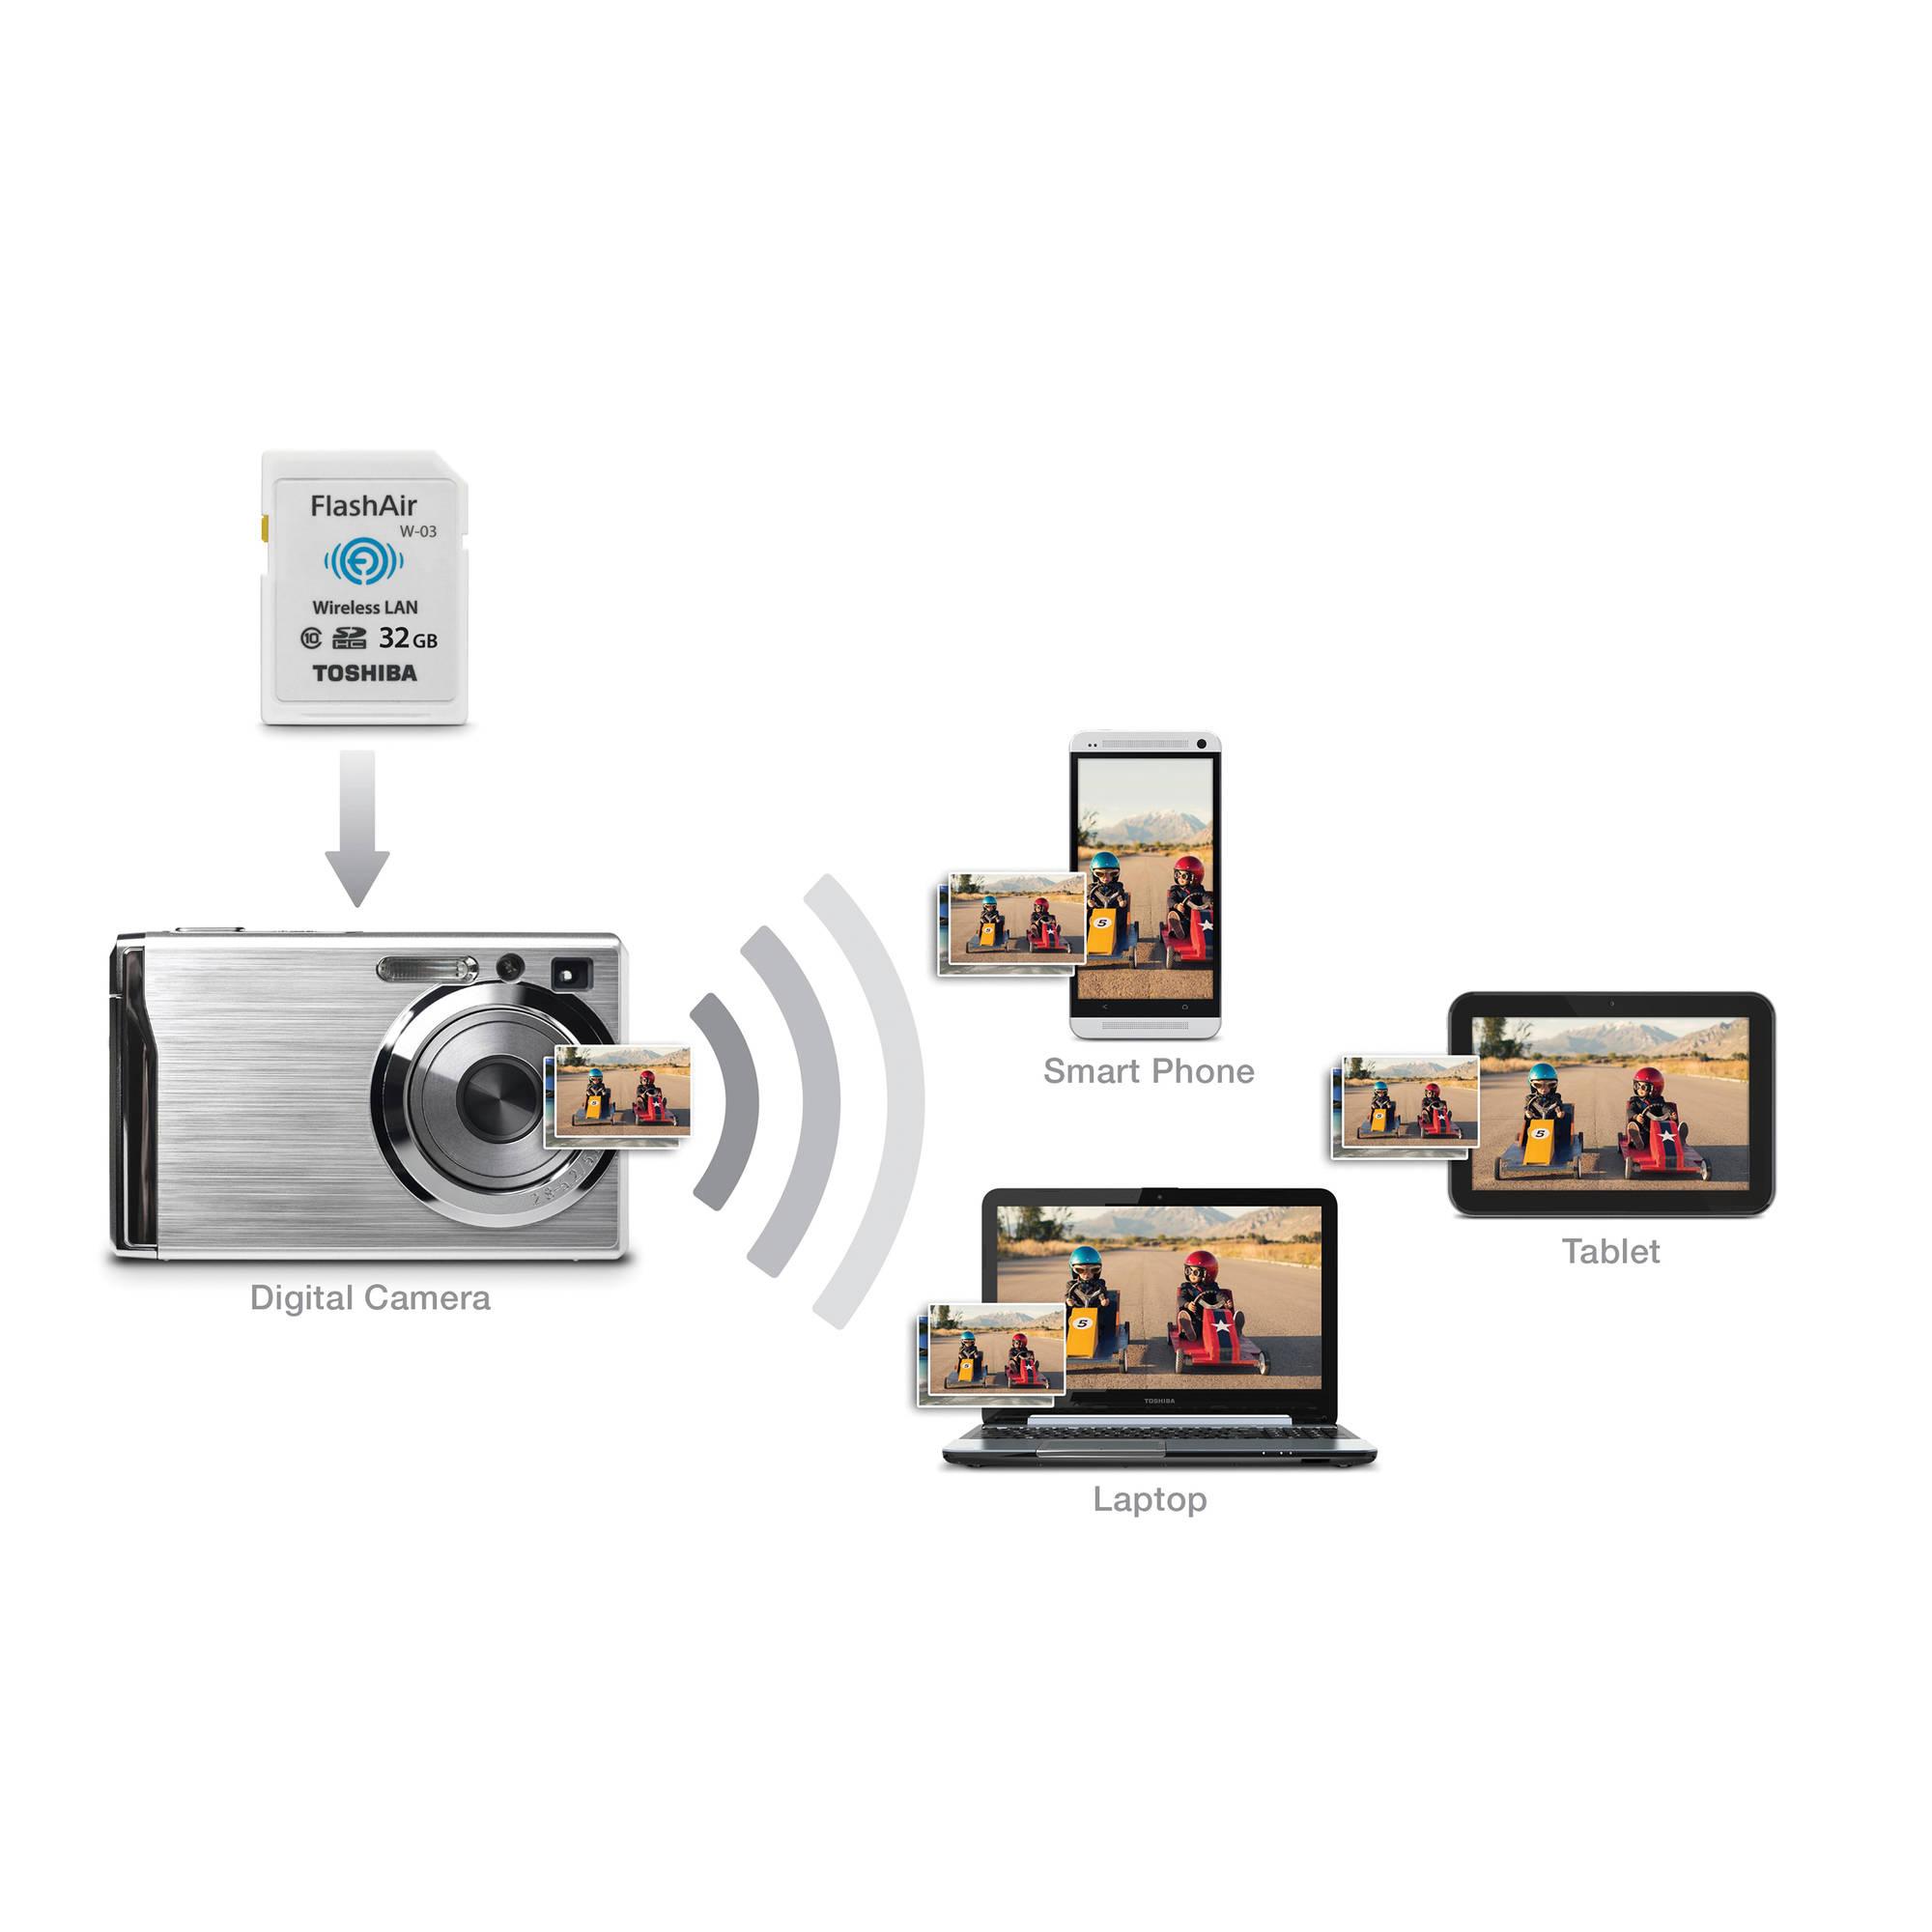 Toshiba 32GB FlashAir III Wireless SD Card